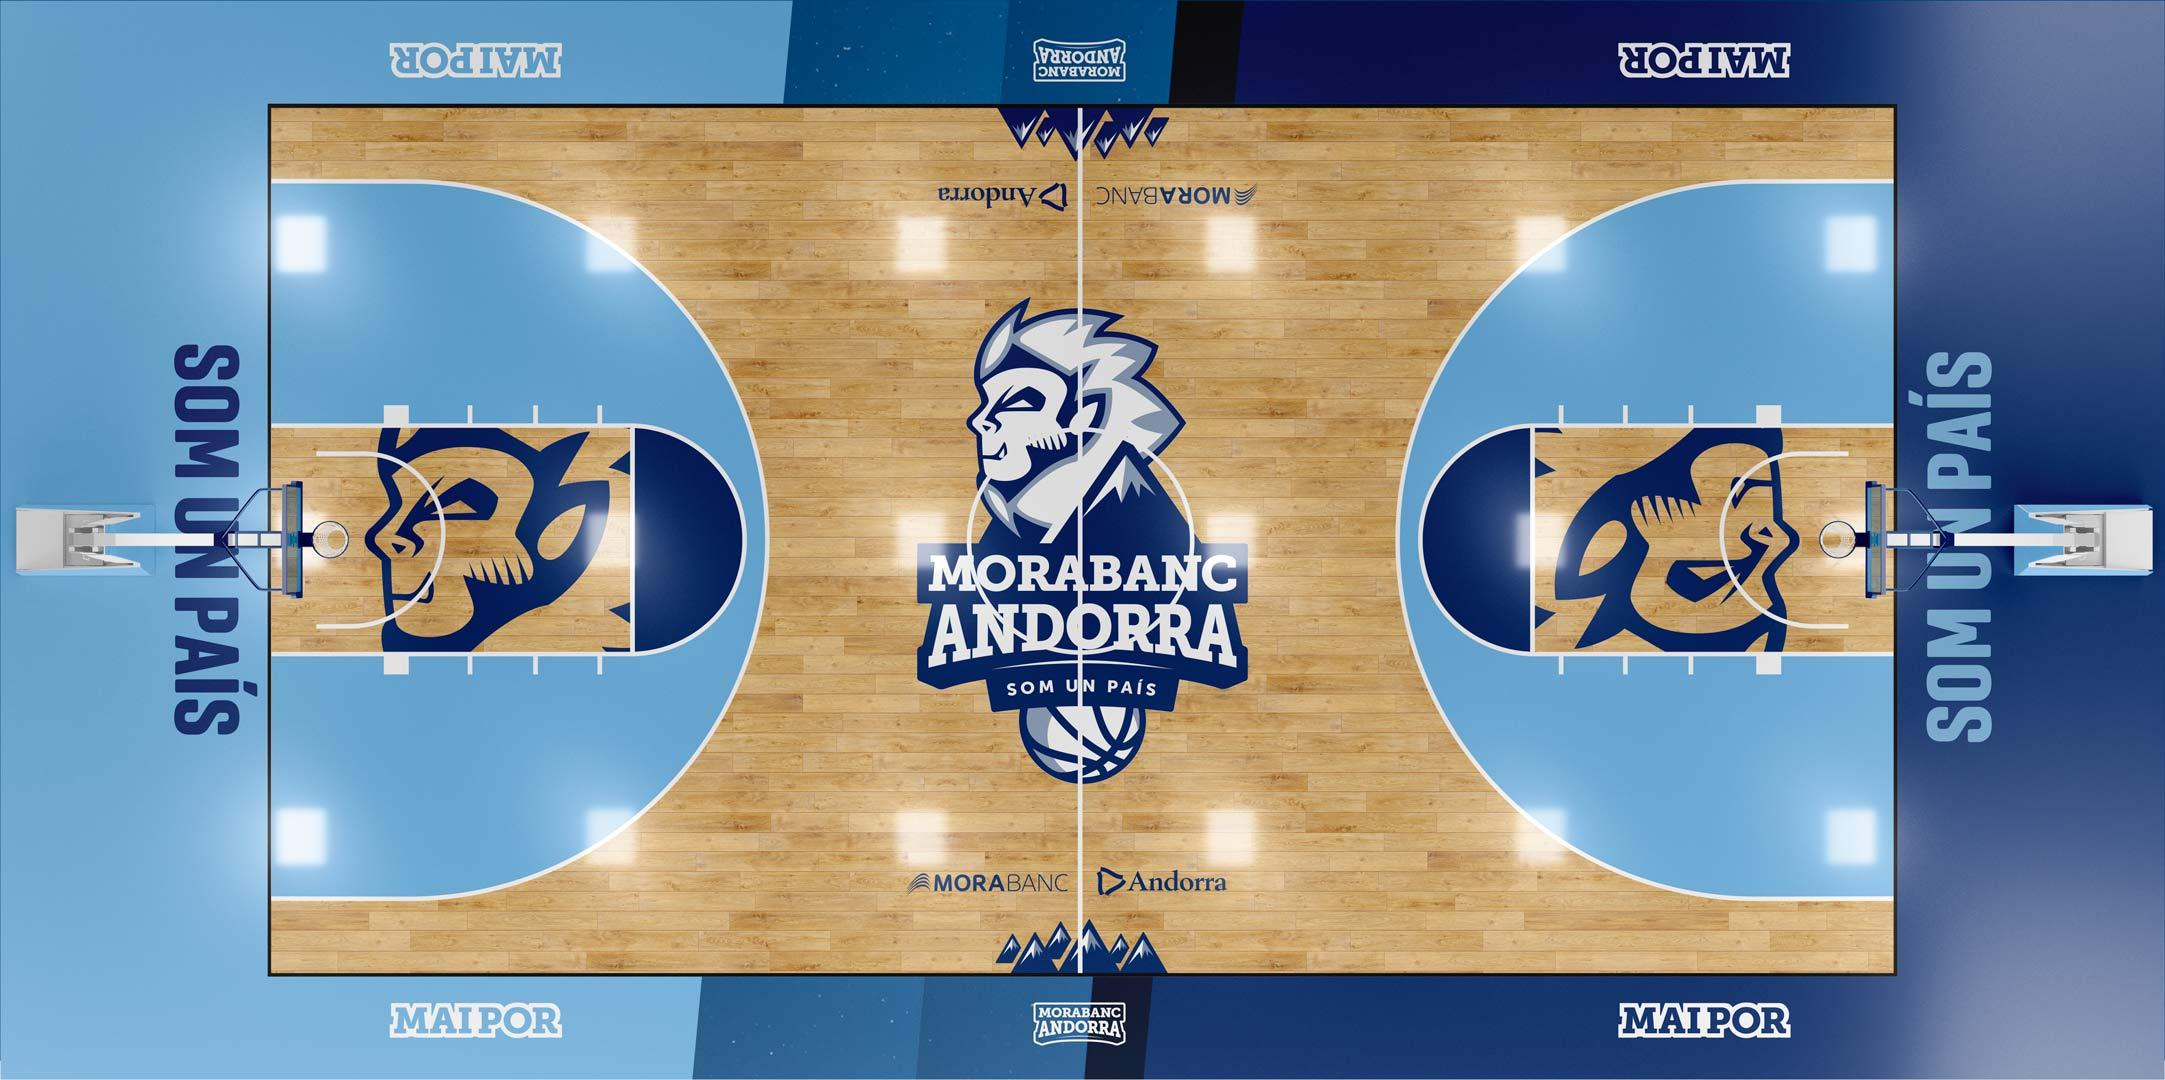 Rediseño Marca e Identidad Corporativa Morabanc Andorra- cancha